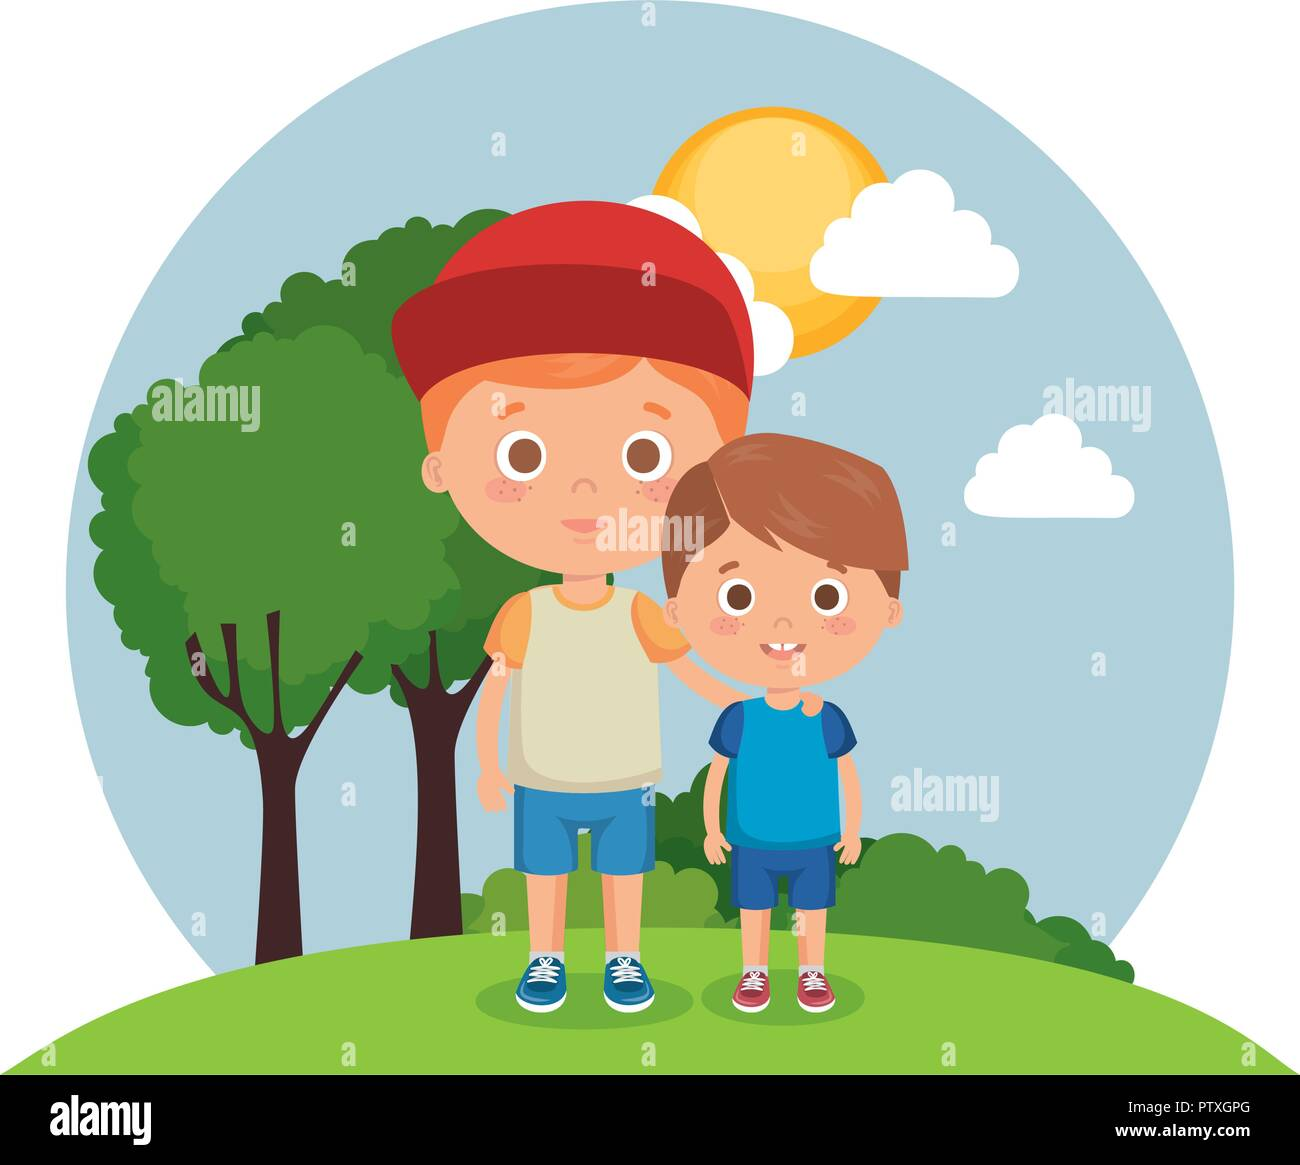 Funny Cartoon Images Of Boys smiling funny cartoon sun stock photos & smiling funny